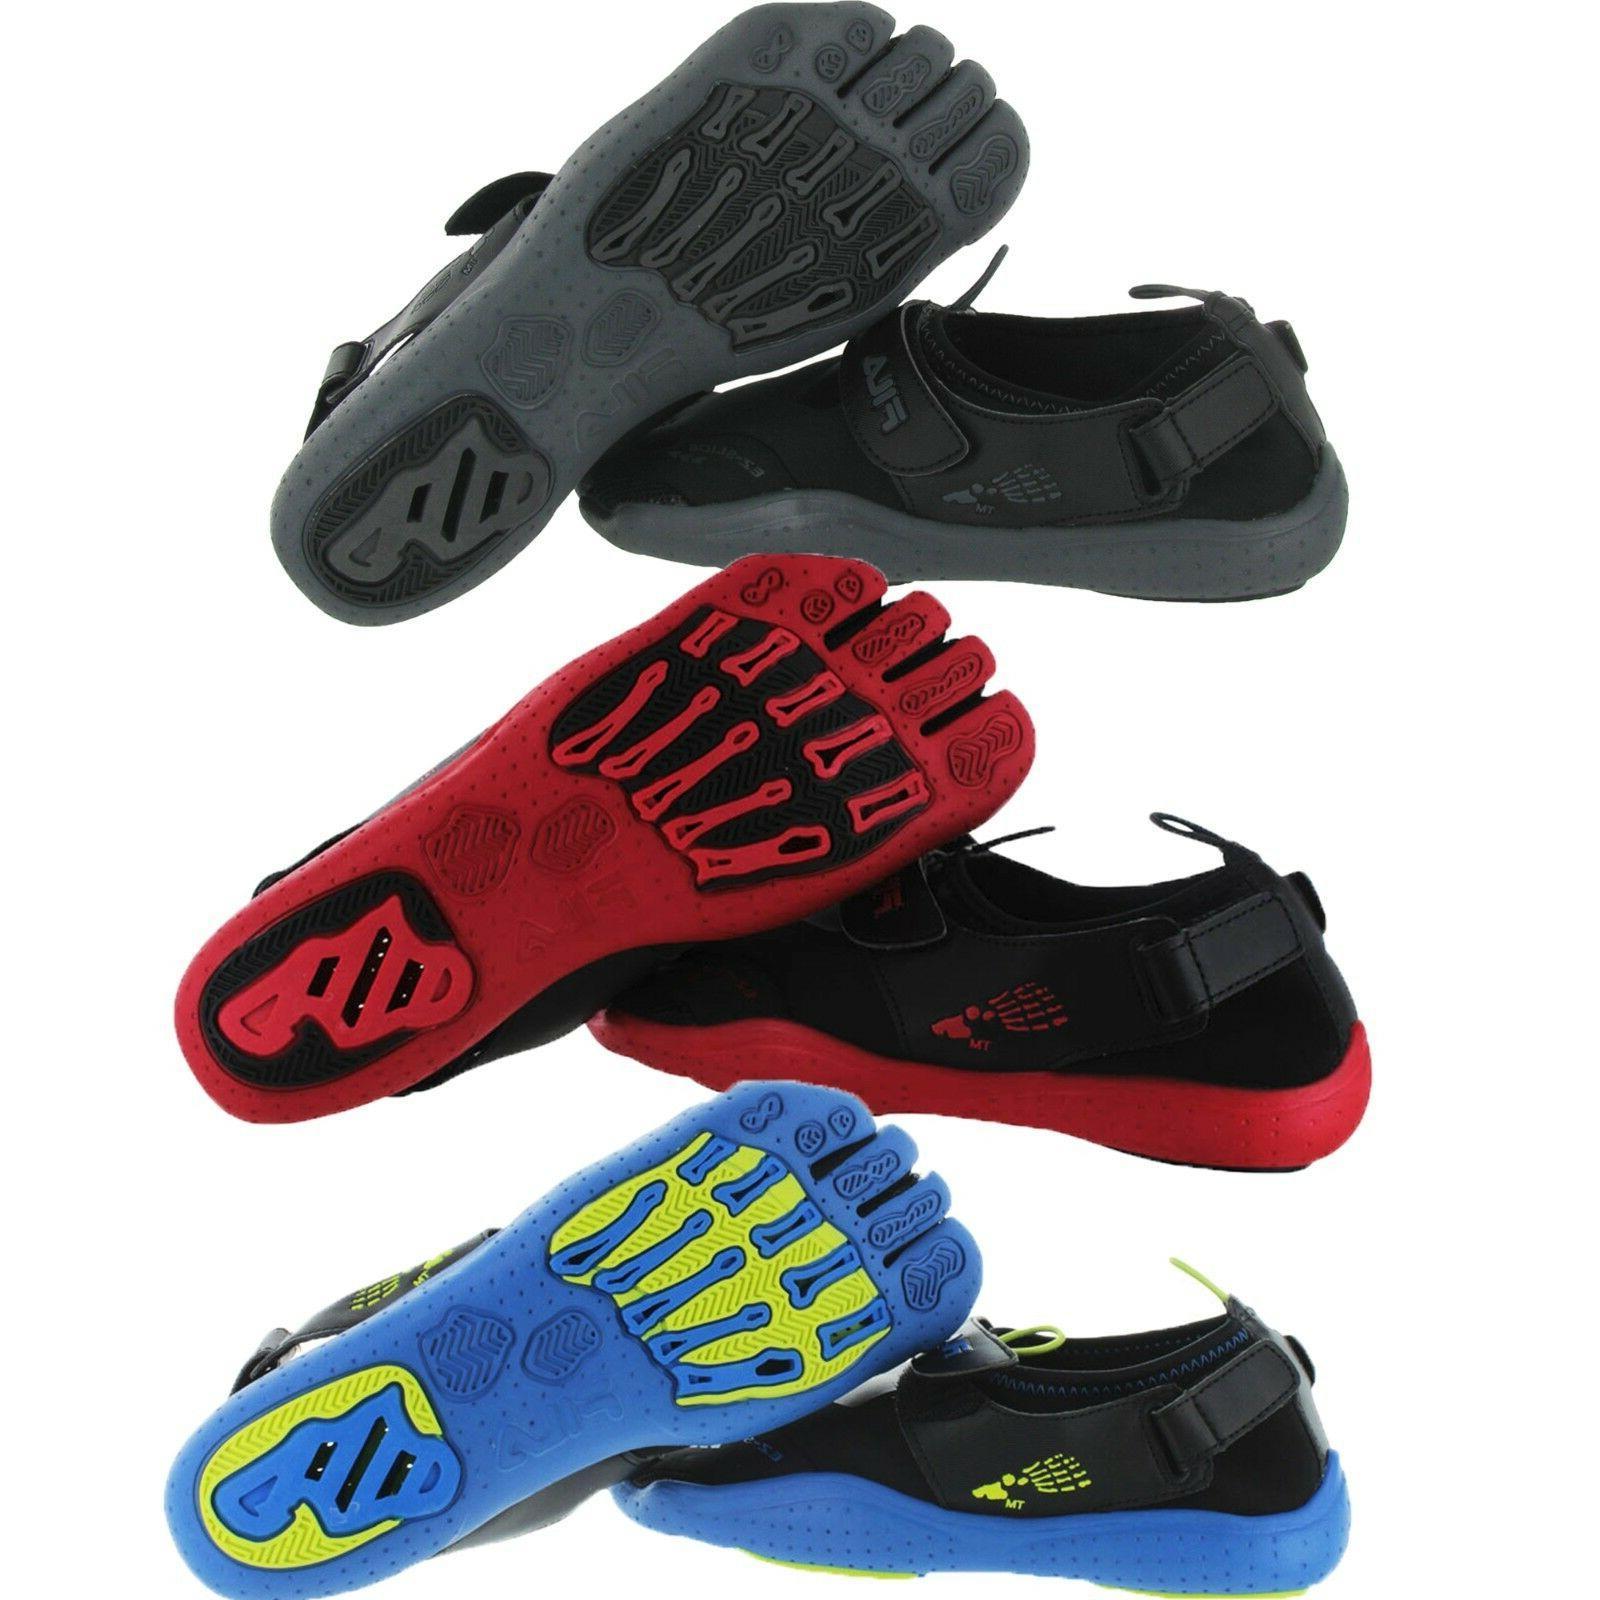 Fila Skele Barefoot Water Shoes